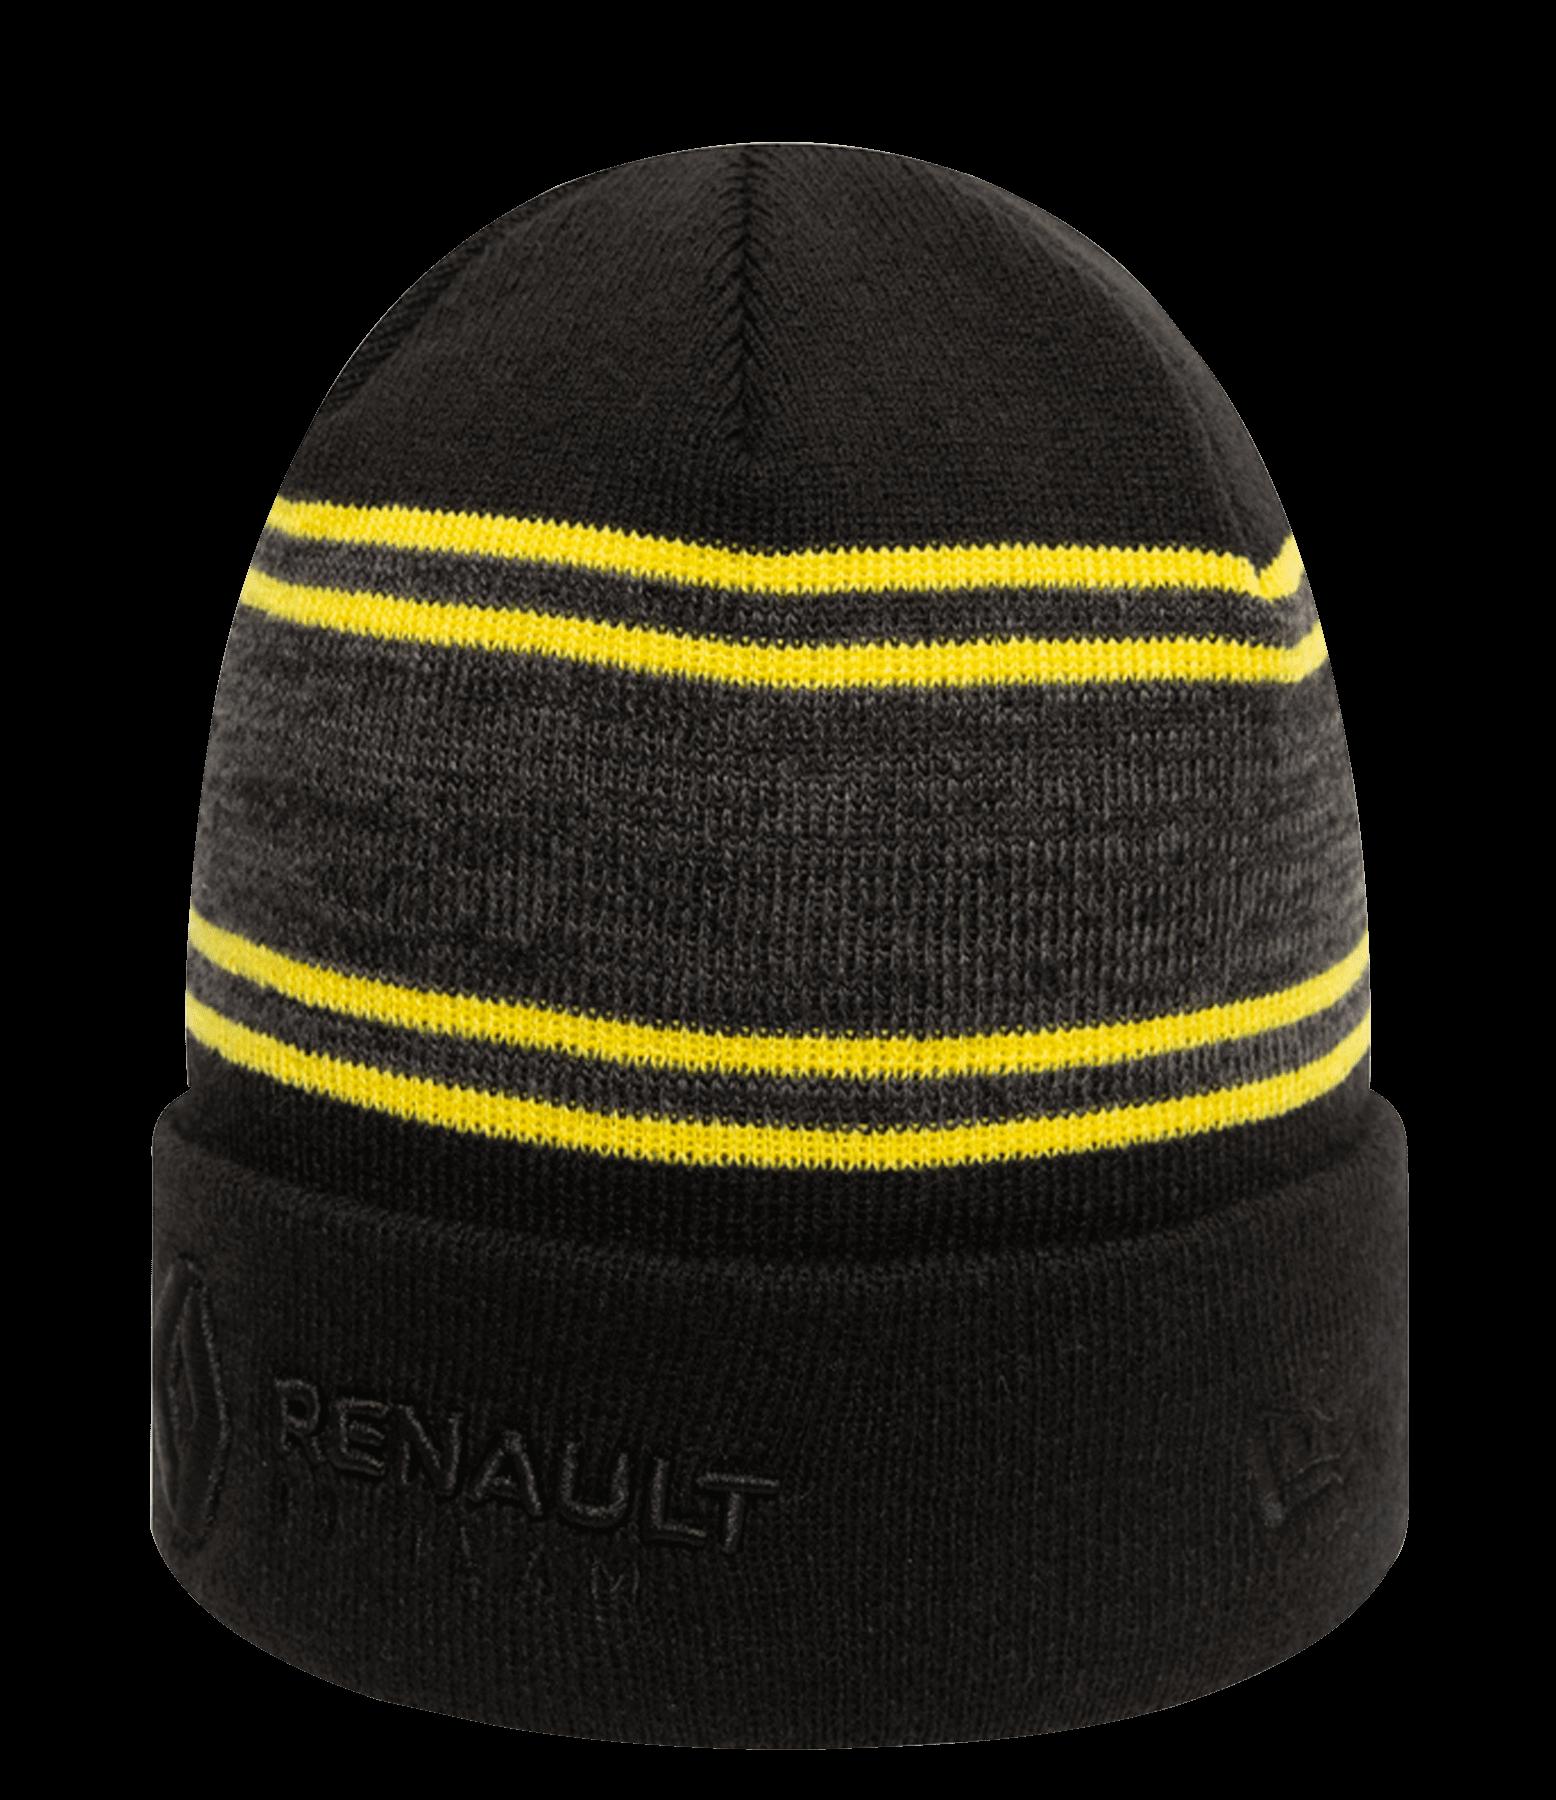 RENAULT F1® TEAM 2019 beanie